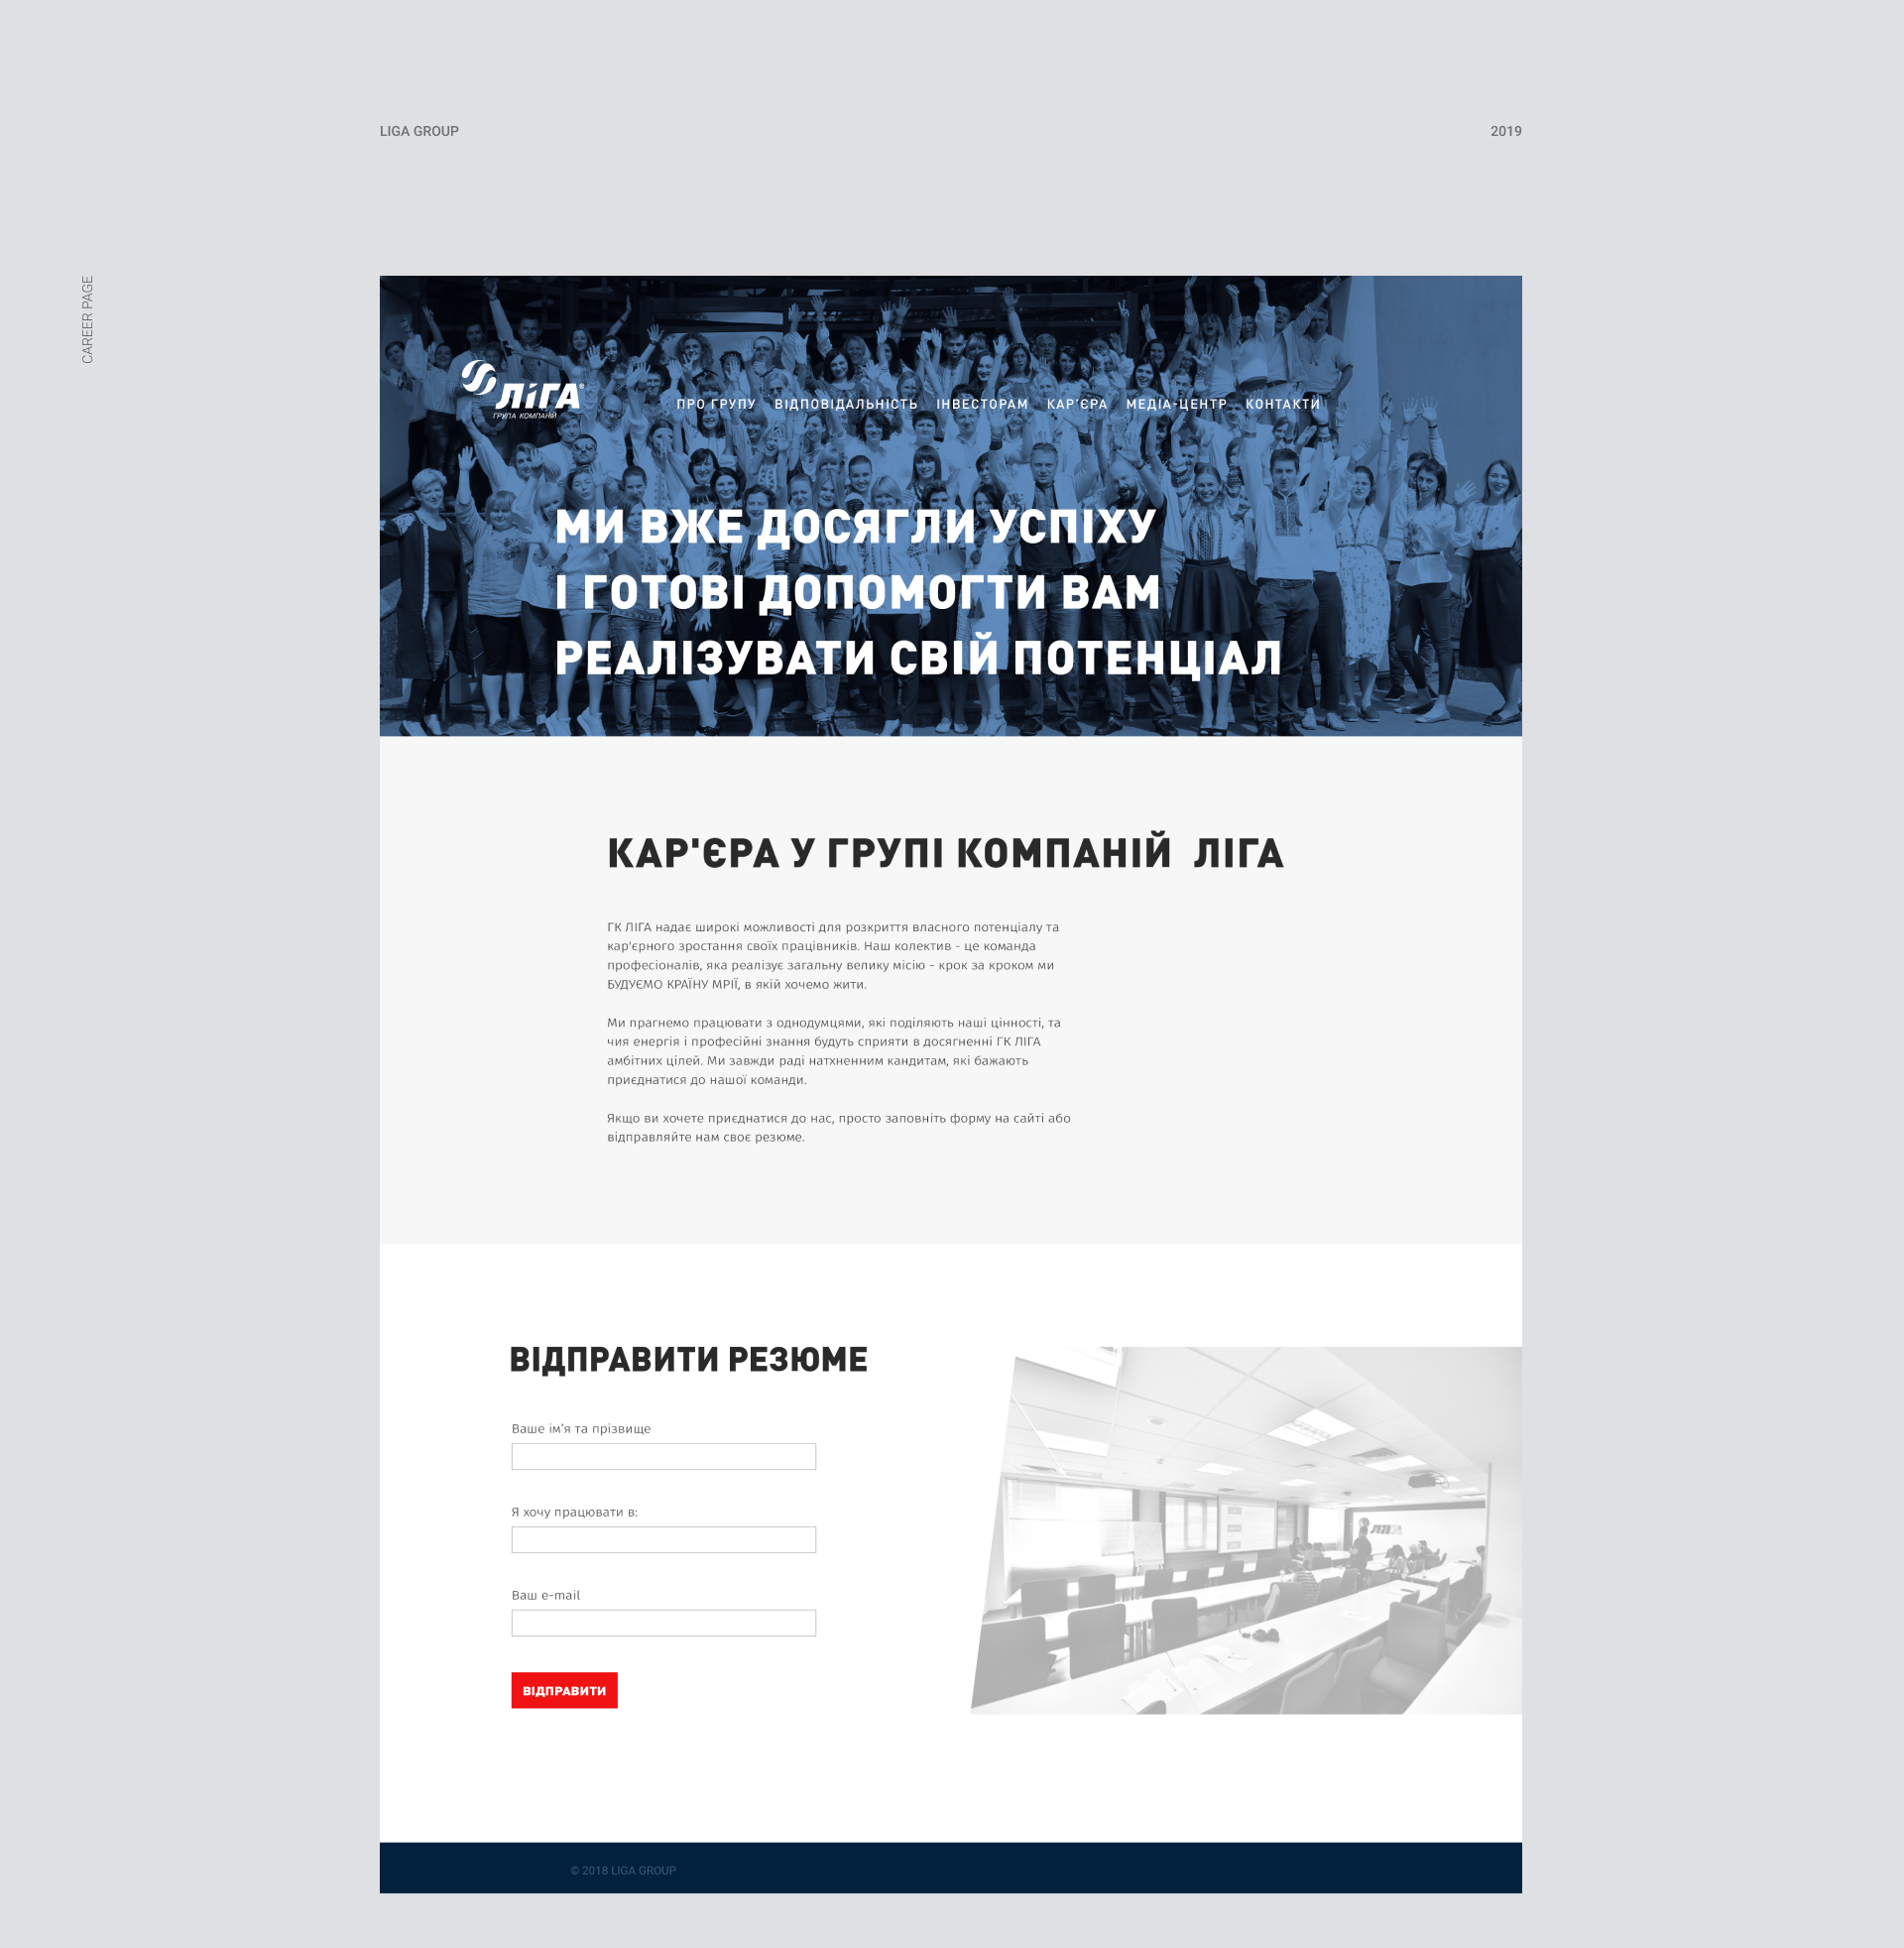 Liga Group corporate website — web design and development